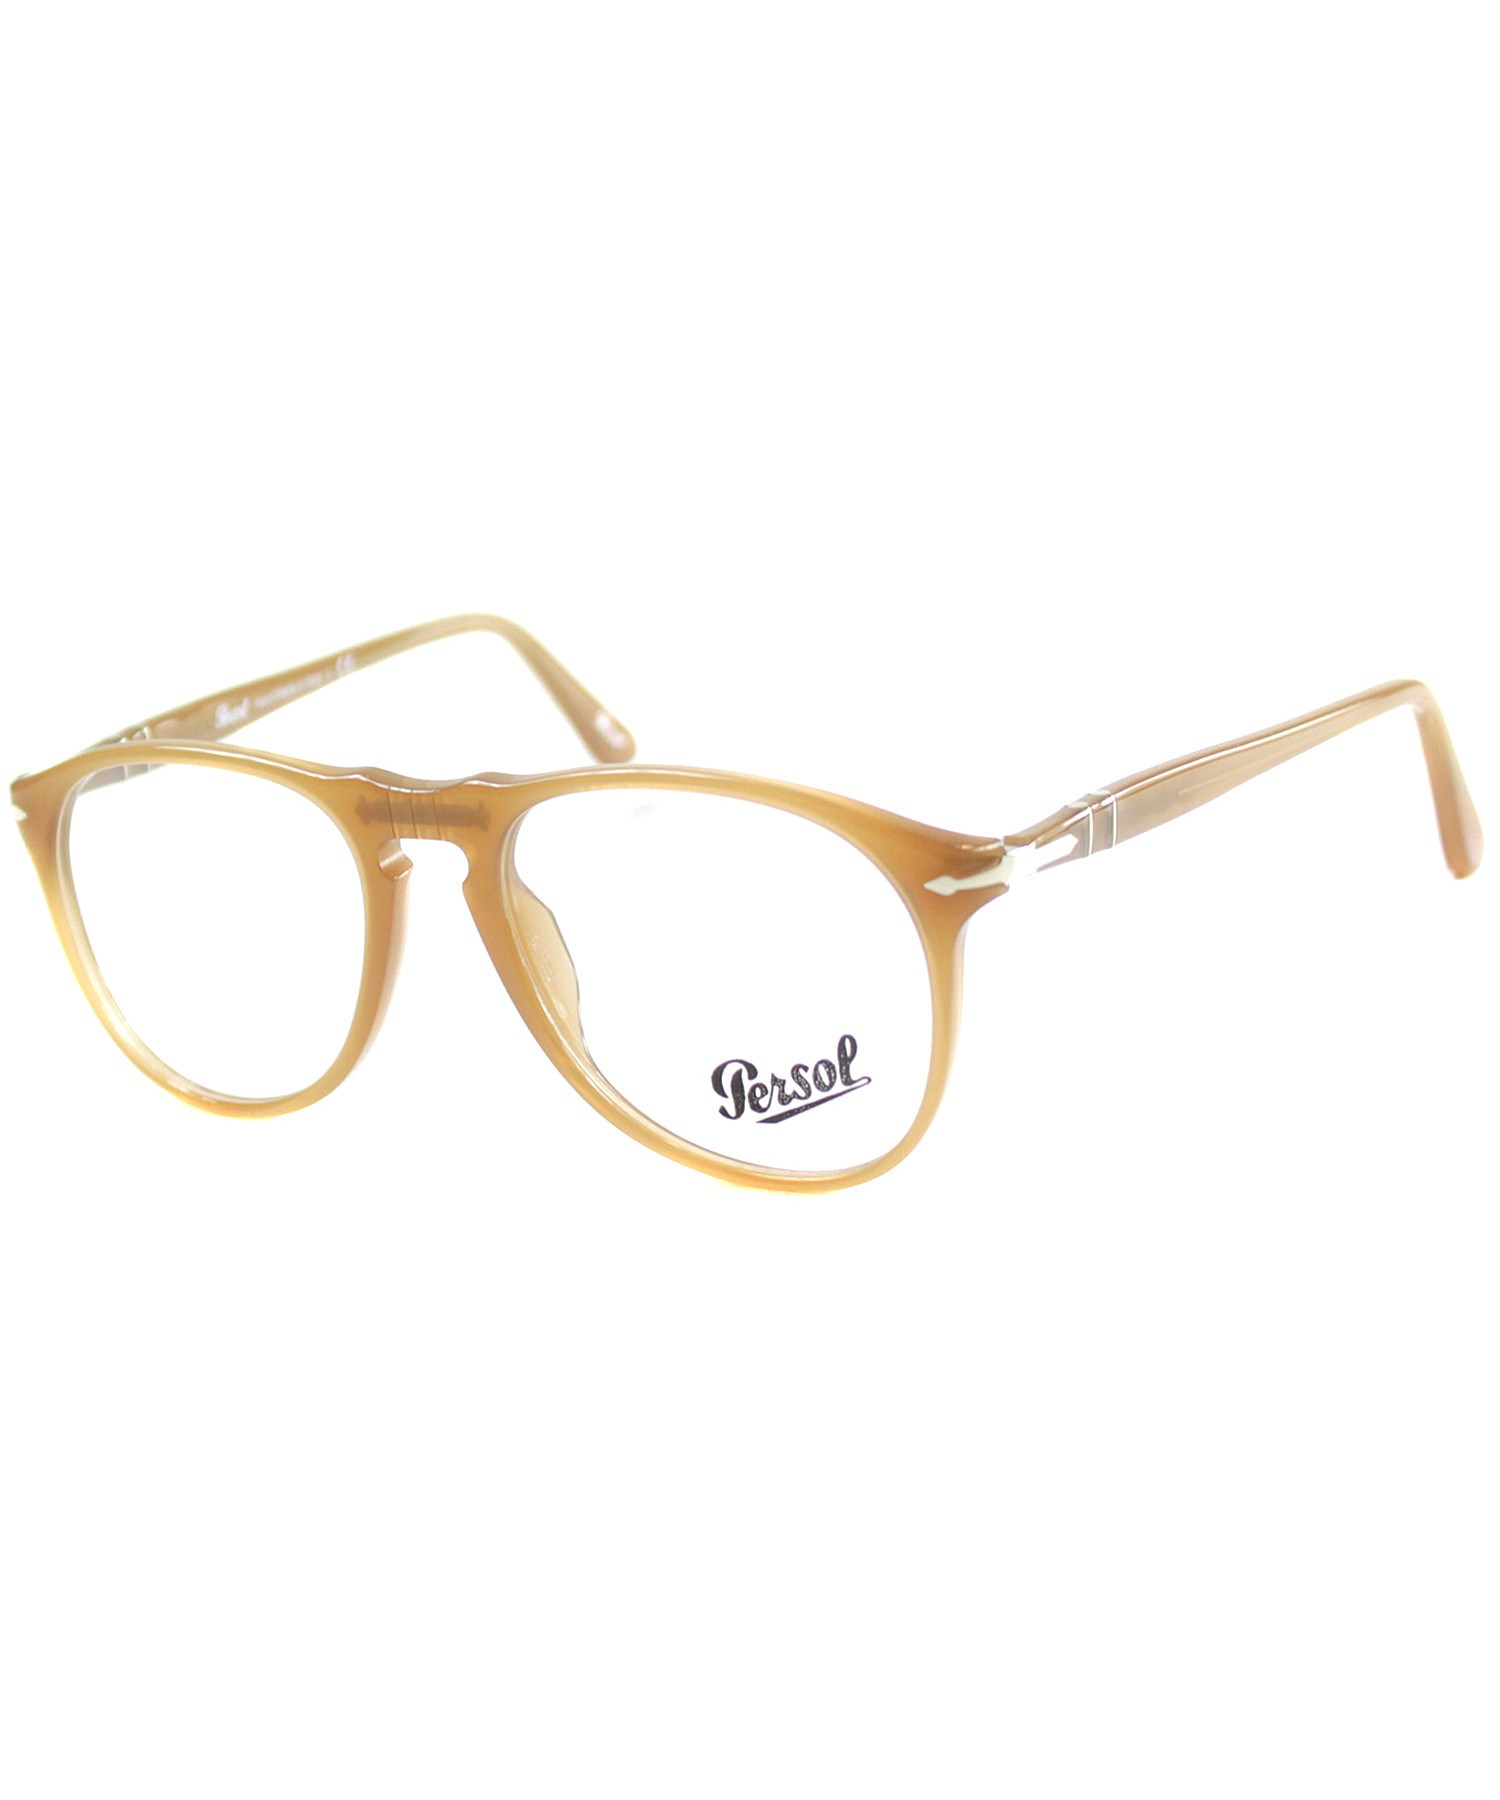 15c7506138 Lyst - Persol Po 9649v 1014 Round Plastic Eyeglasses in Brown